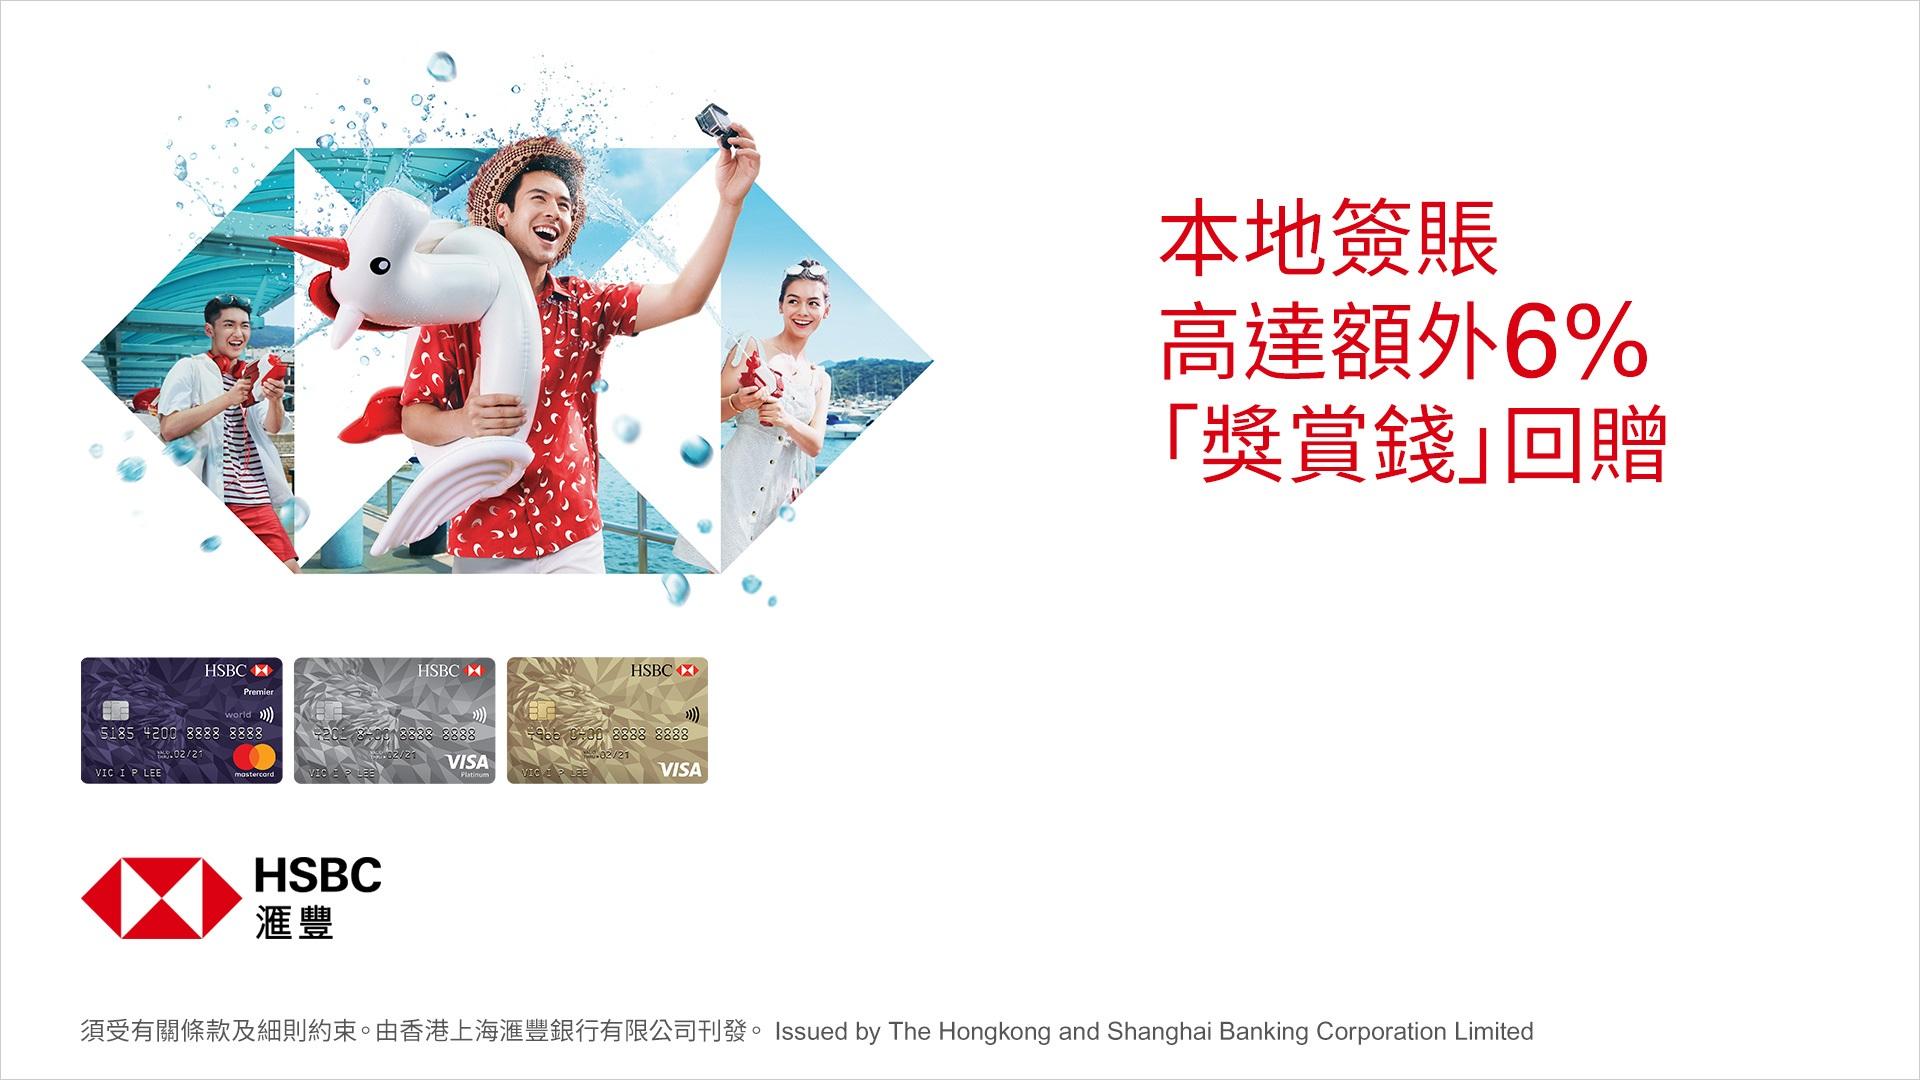 HSBC 最紅大折日本地簽賬優惠!可額外賺取$1,000「獎賞錢」!即10,000 Asia Miles 或15,000 Avios!